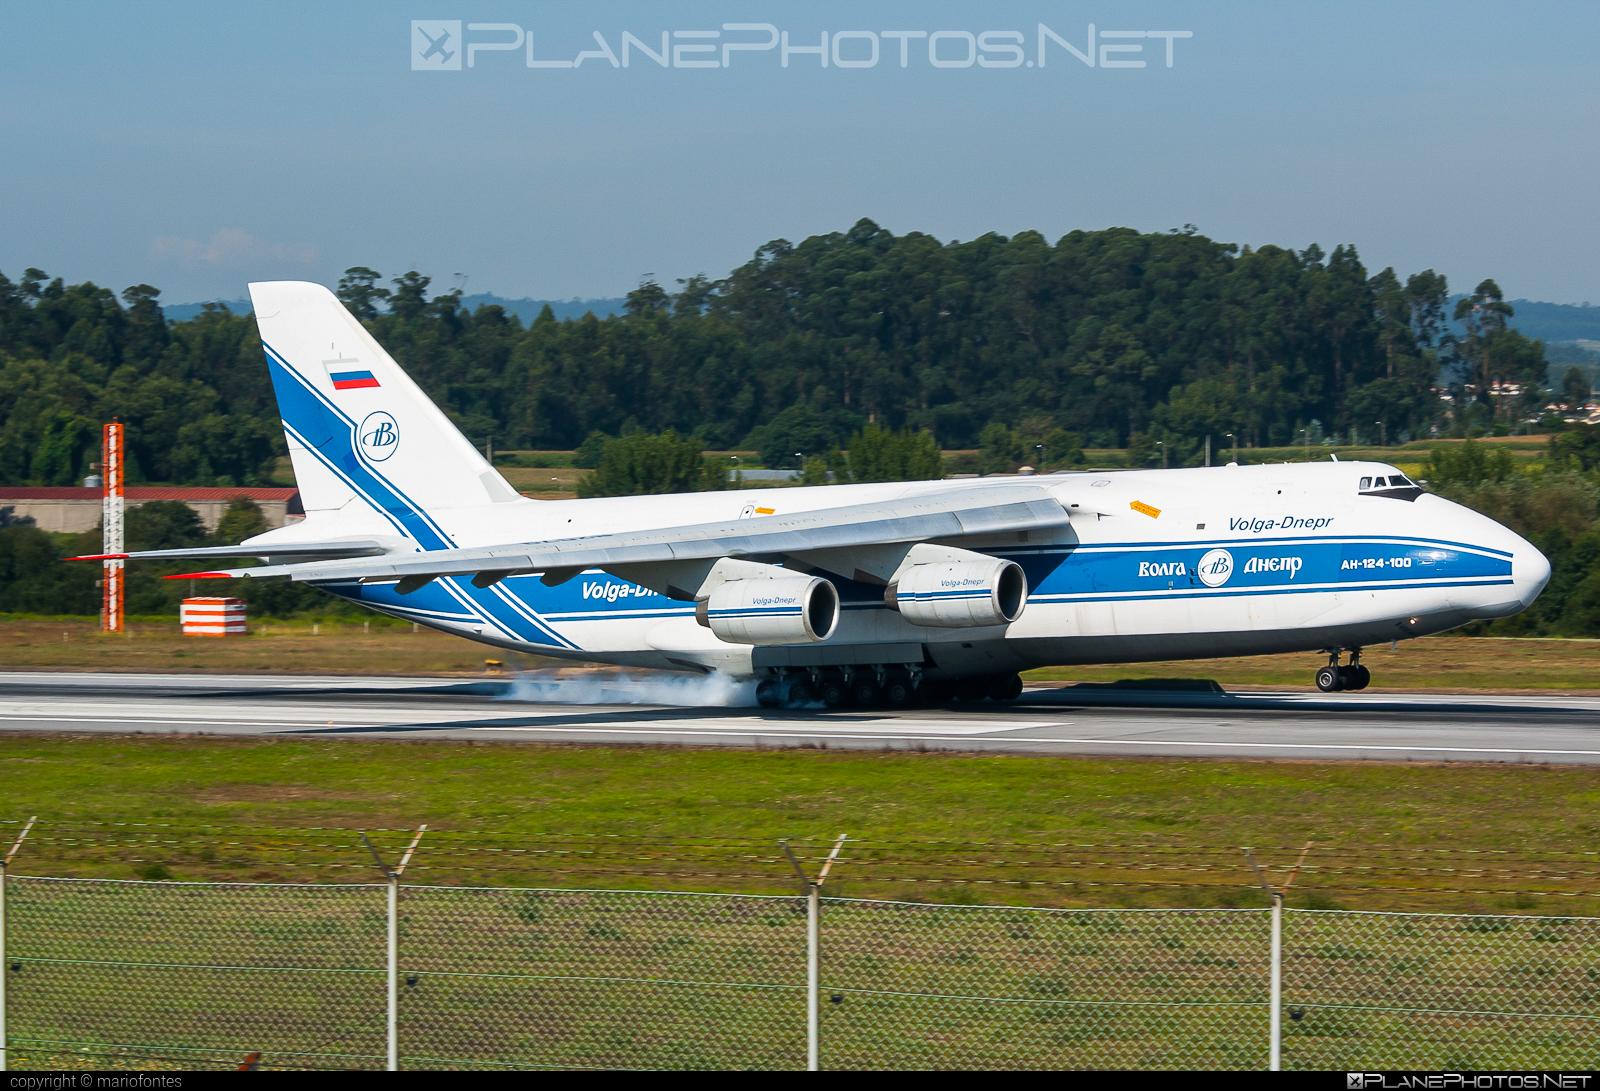 Antonov An-124-100 Ruslan - RA-82079 operated by Volga Dnepr Airlines #an124 #an124100 #antonov #antonov124 #ruslan